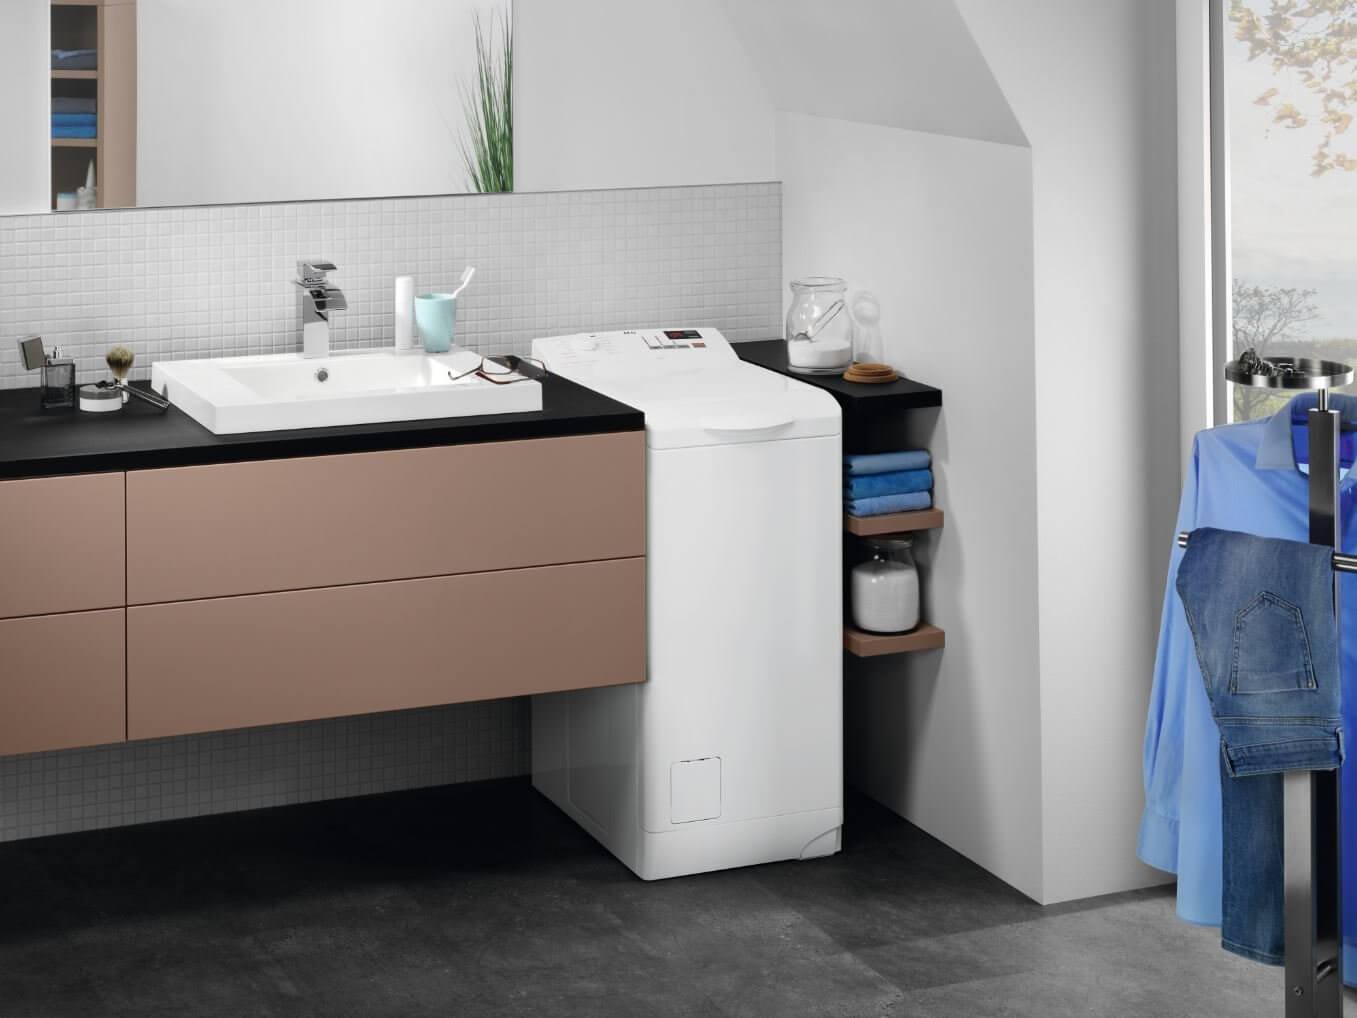 Perfekt Waschmaschine Schmal Bestand An Waschmaschinen Dekoration